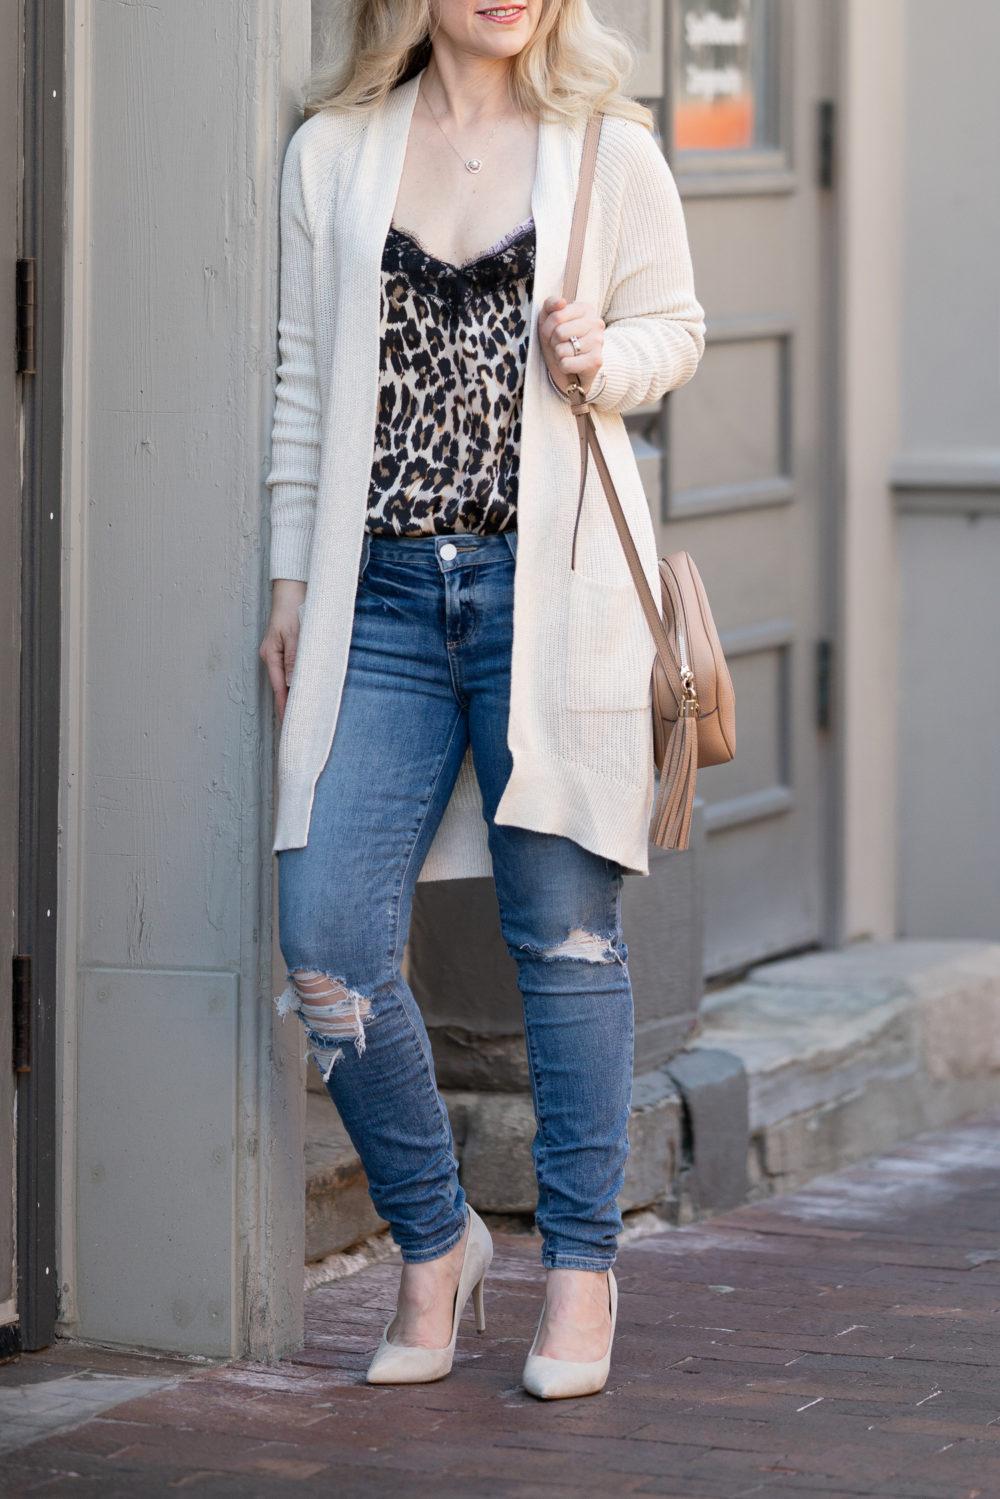 Petite Fashion Blog | Nordstrom Anniversary Sale | BP. Longline Open Cardigan | Paige Verdugo Ripped Crop Skinny Jeans | BP Lace Trim Satin Camisole Top